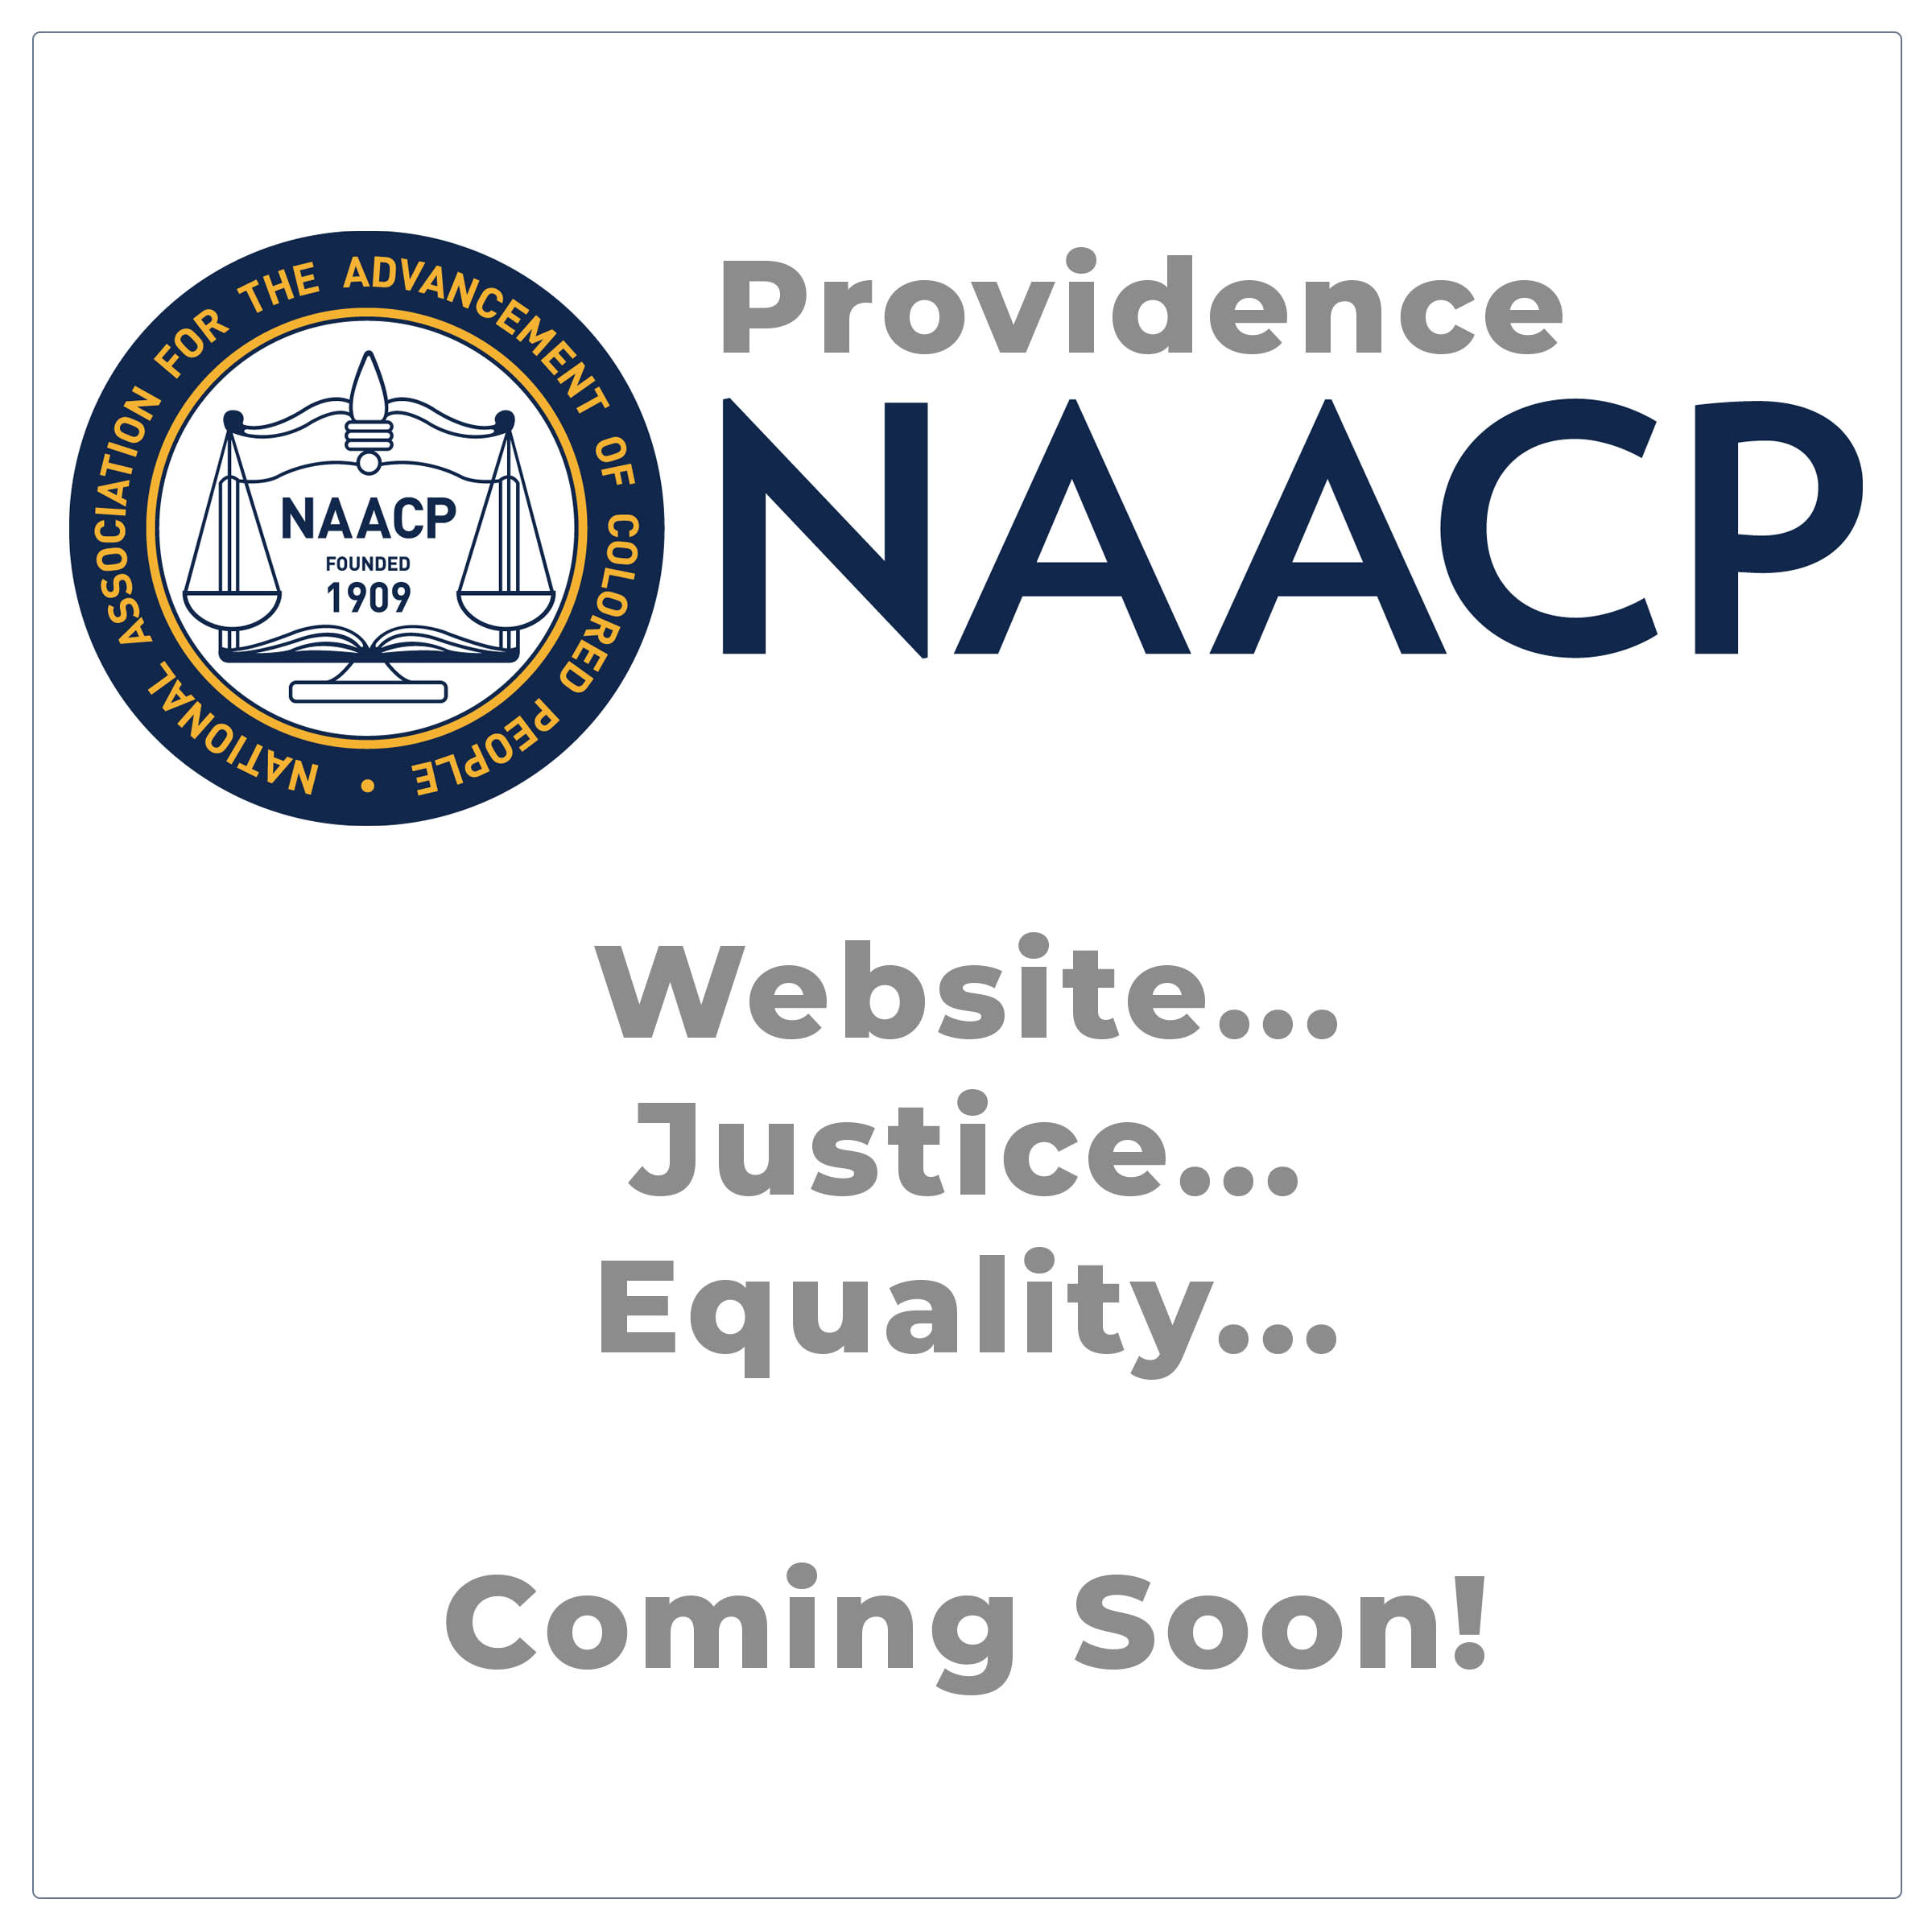 NAACP Providence